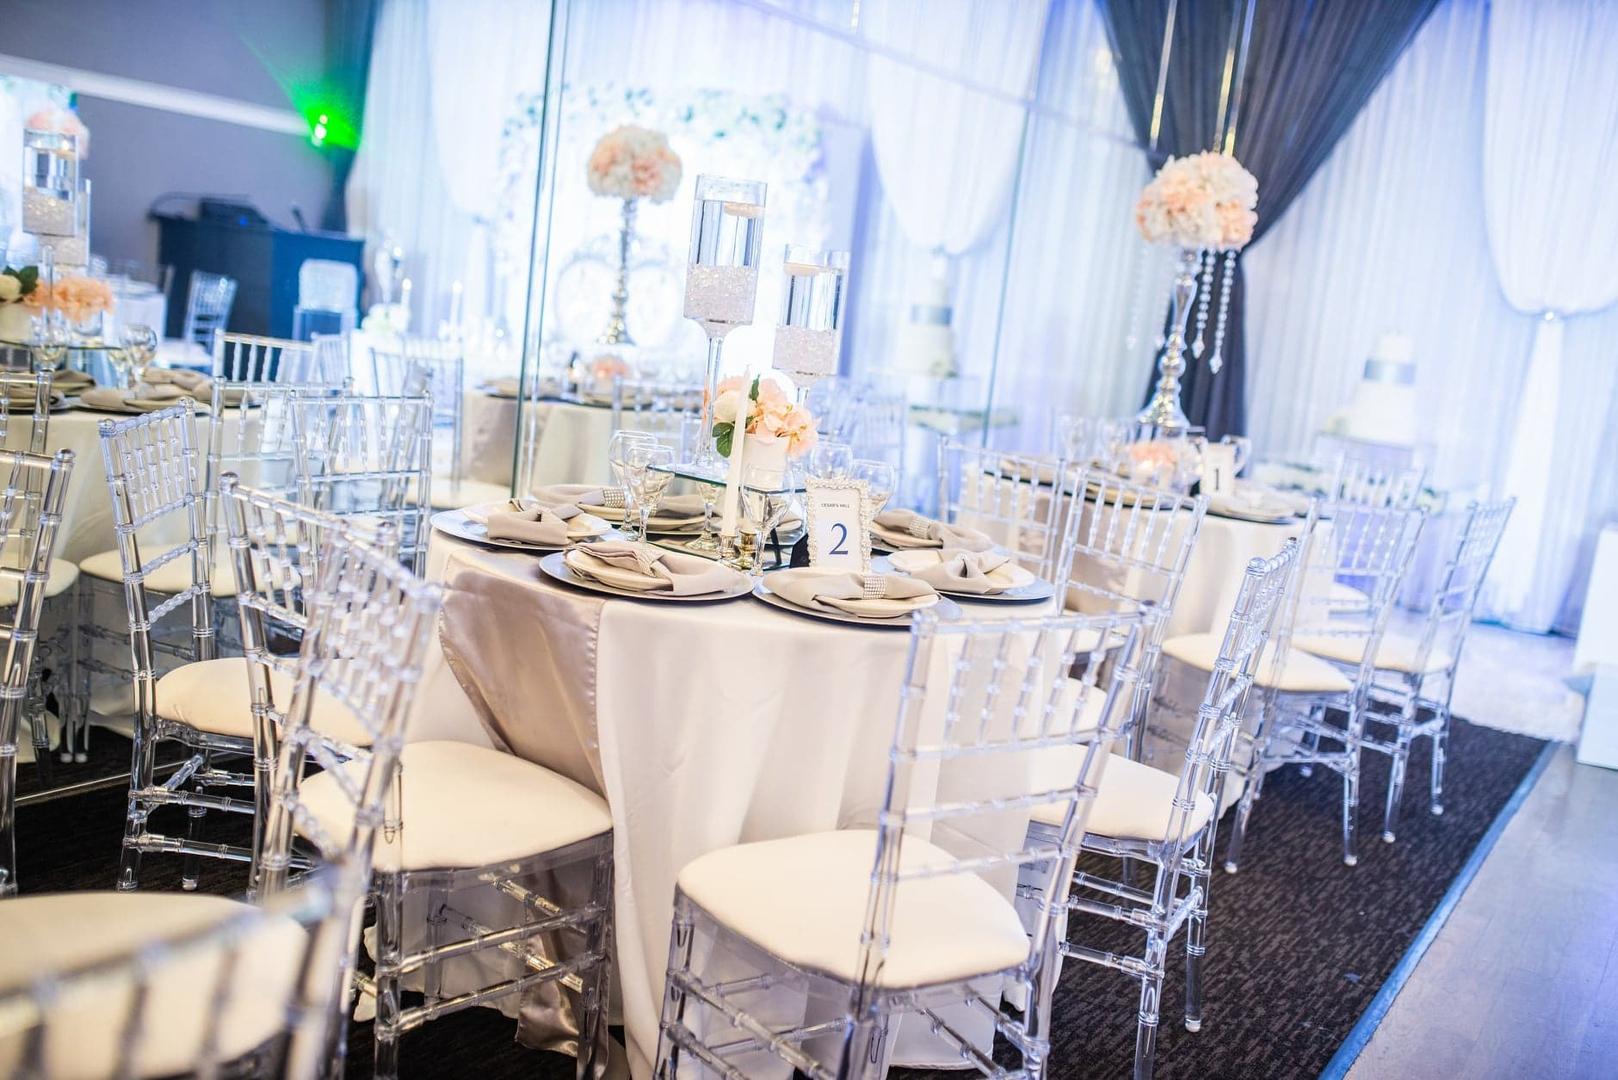 Nj Banquet Hall Decorations Party Rentals Cesar Hall West